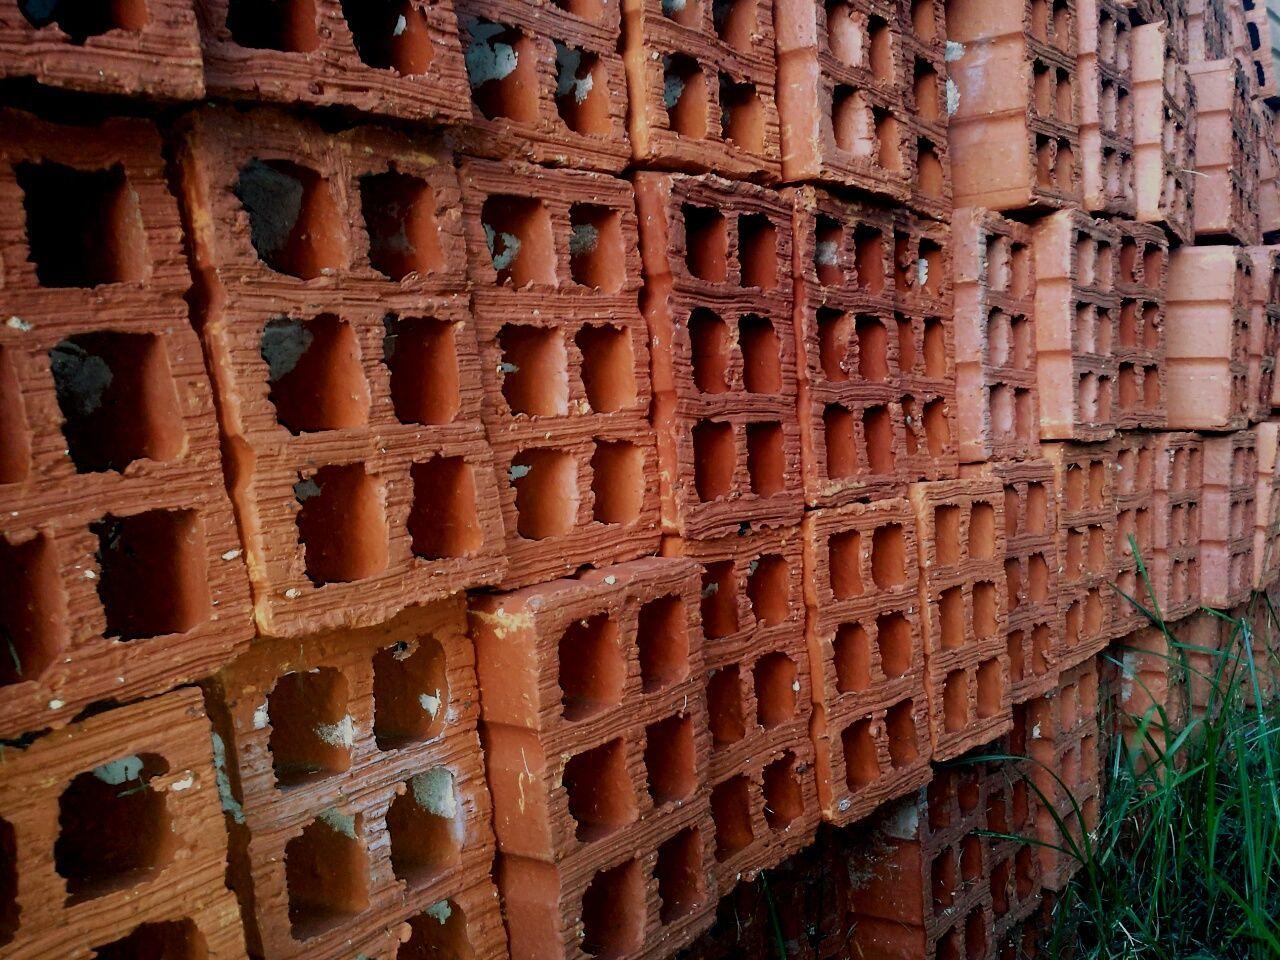 Stack Of Brick Blocks Arranged Outdoors